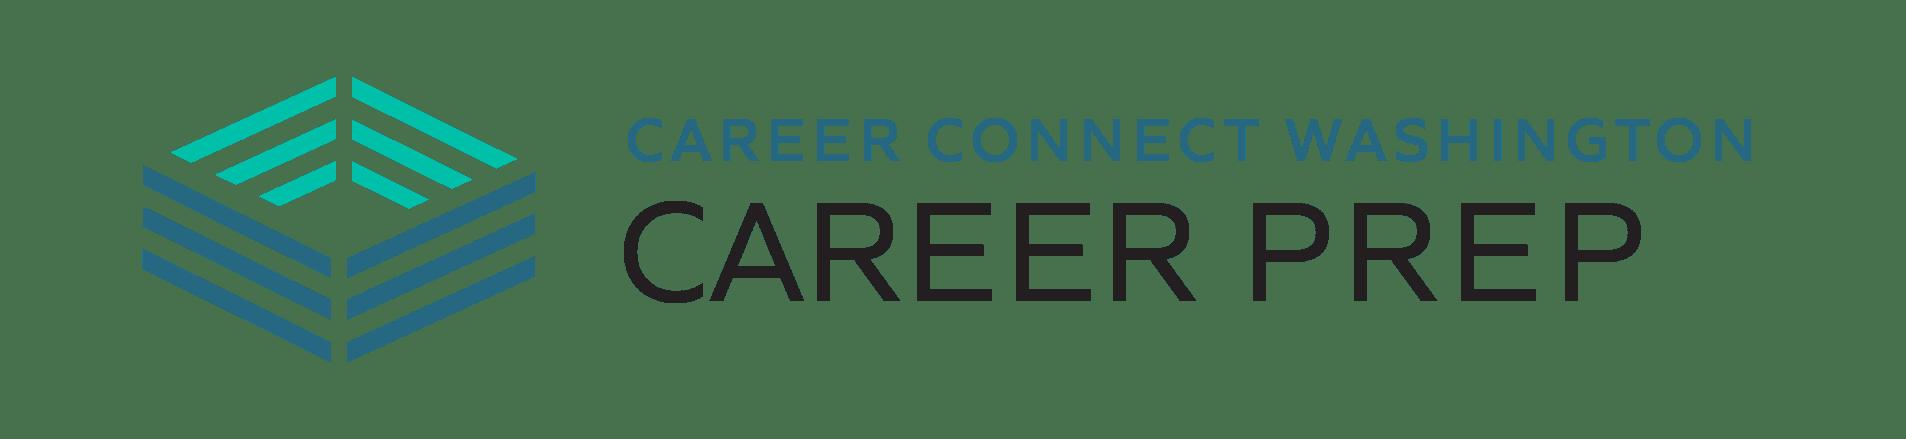 Career Connect Washington - Career Prep